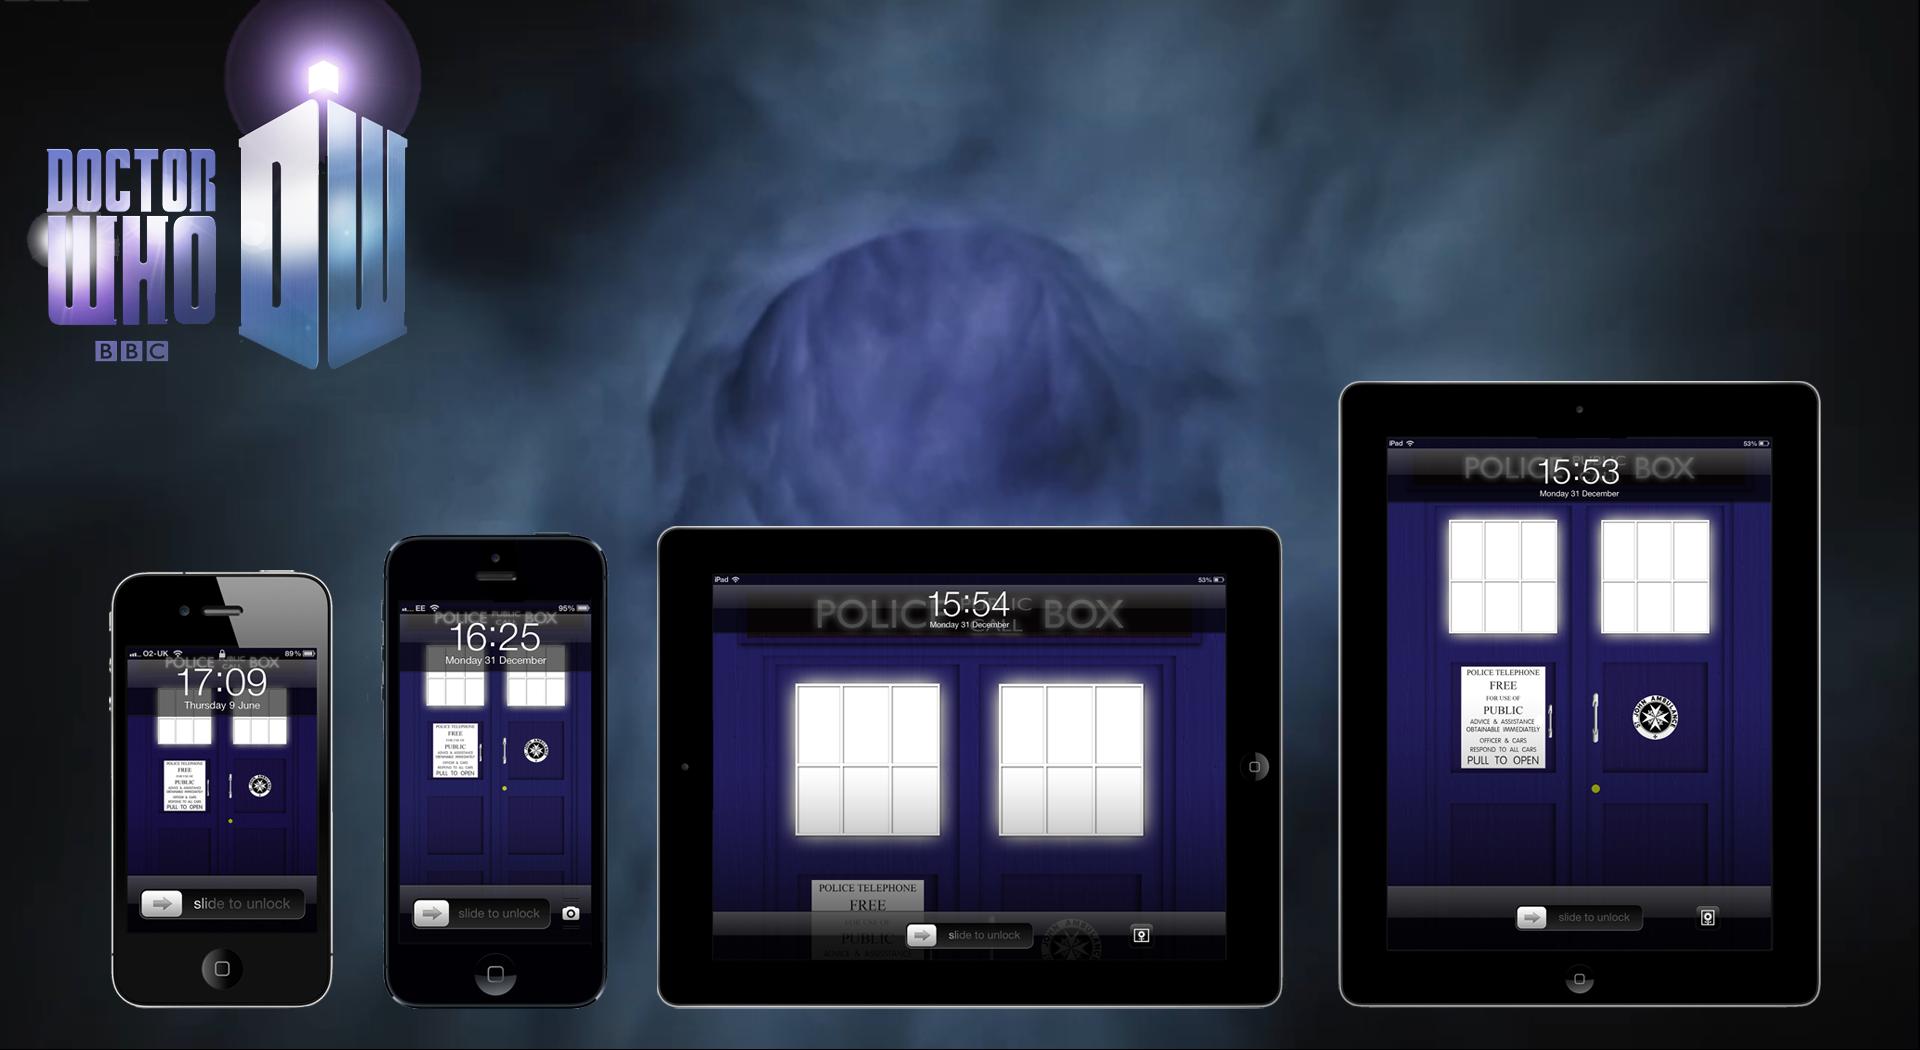 TARDIS Wallpaper - now for iPhone 5 + Retina iPads by deebeeArt